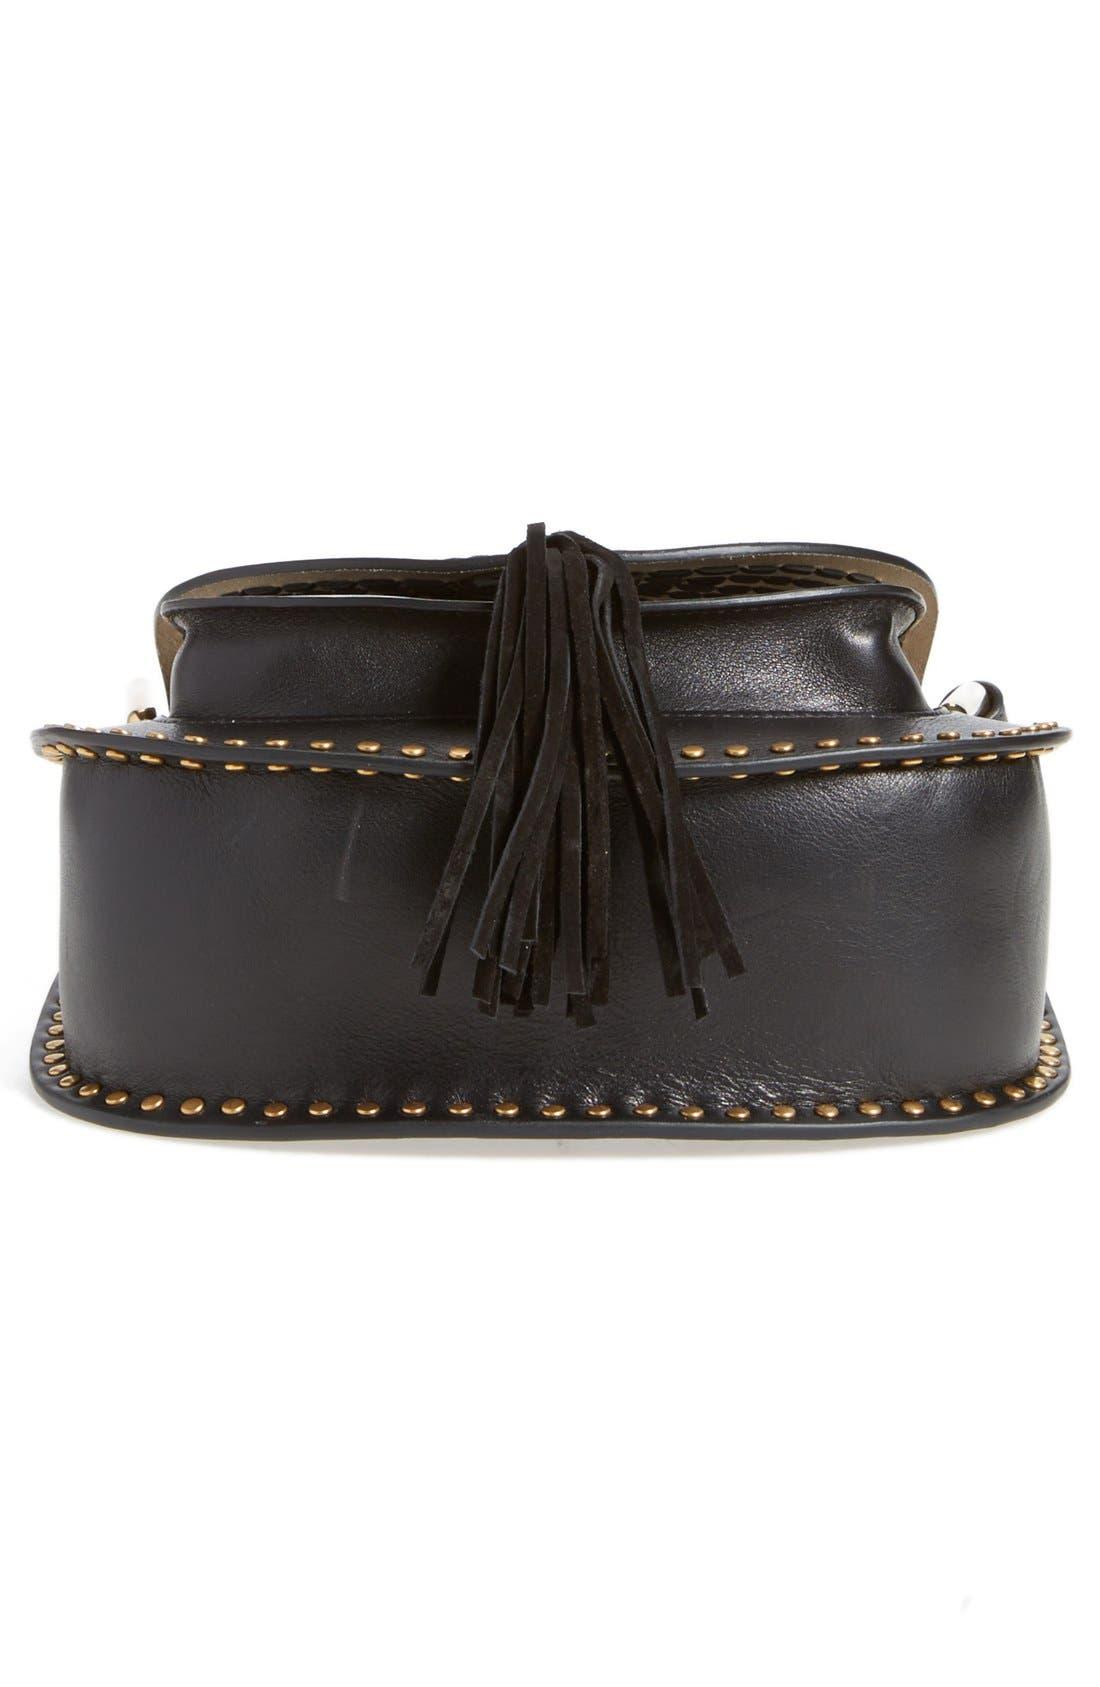 CHLOÉ,                             'Small Hudson' Studded Calfskin Leather Crossbody Bag,                             Alternate thumbnail 2, color,                             001